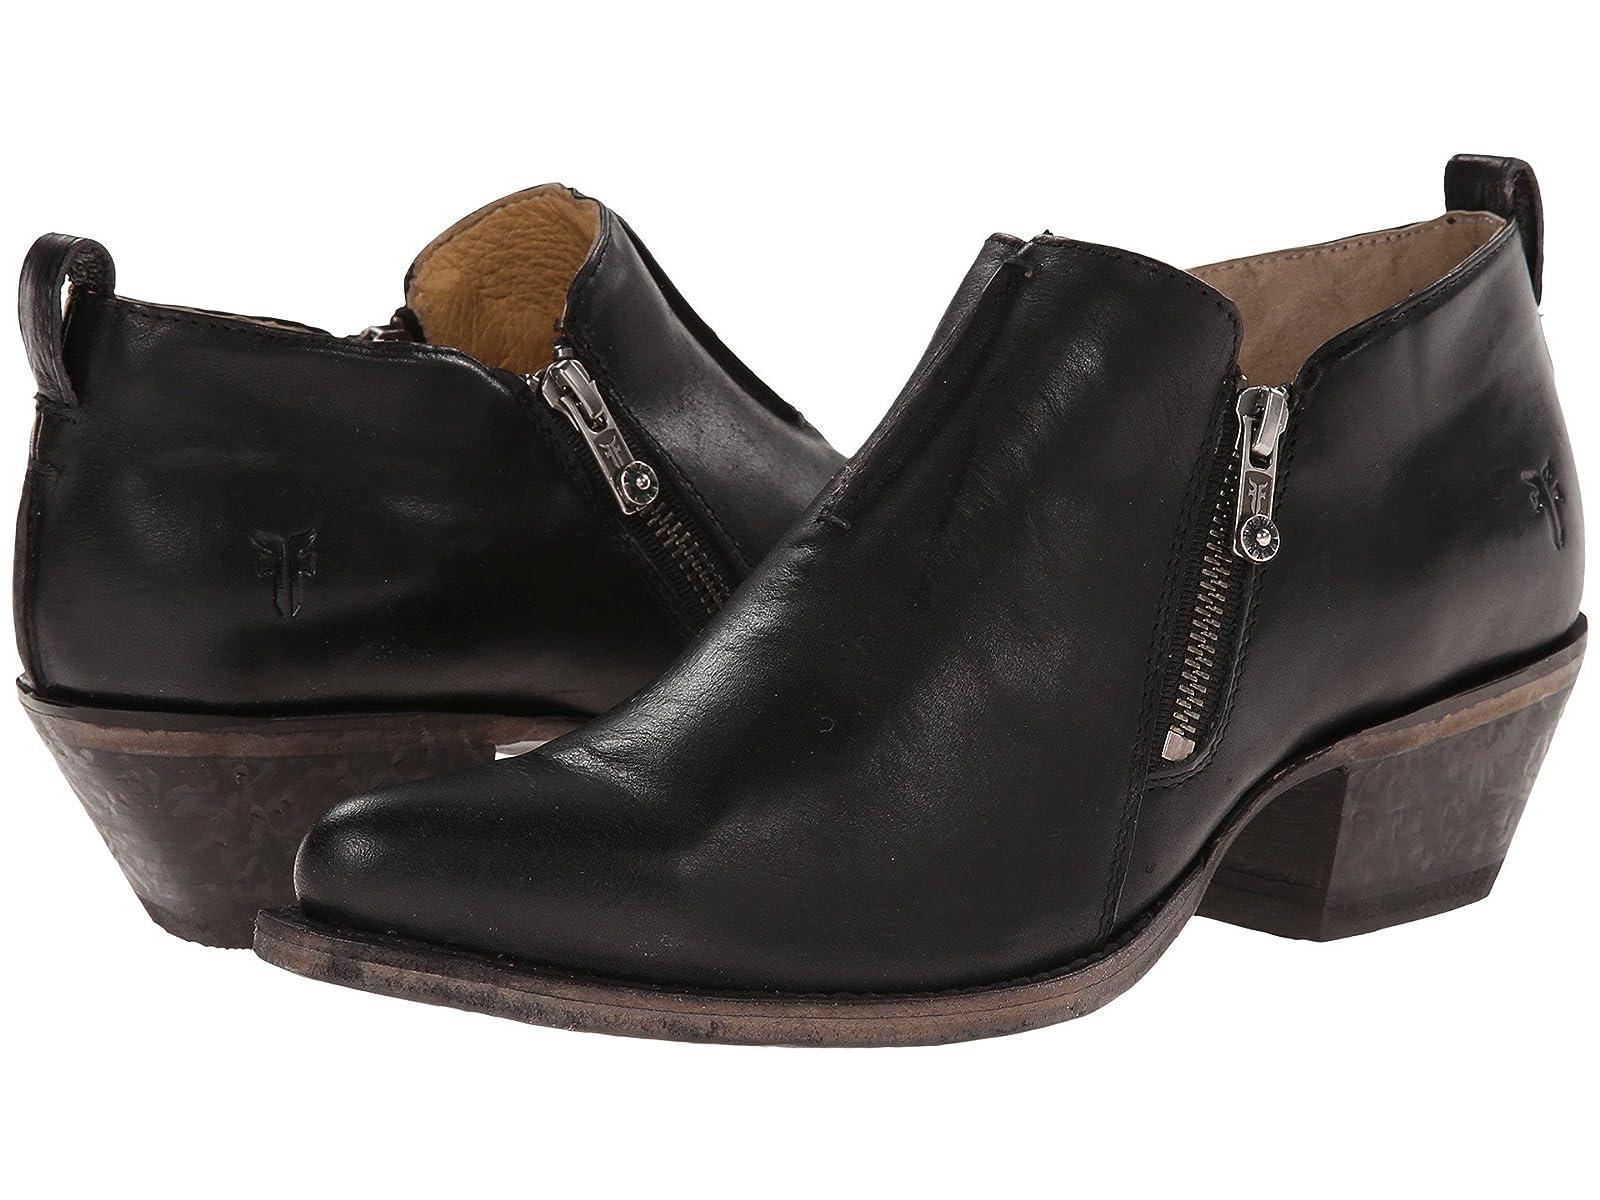 Frye Sacha Moto ShootieAffordable and distinctive shoes